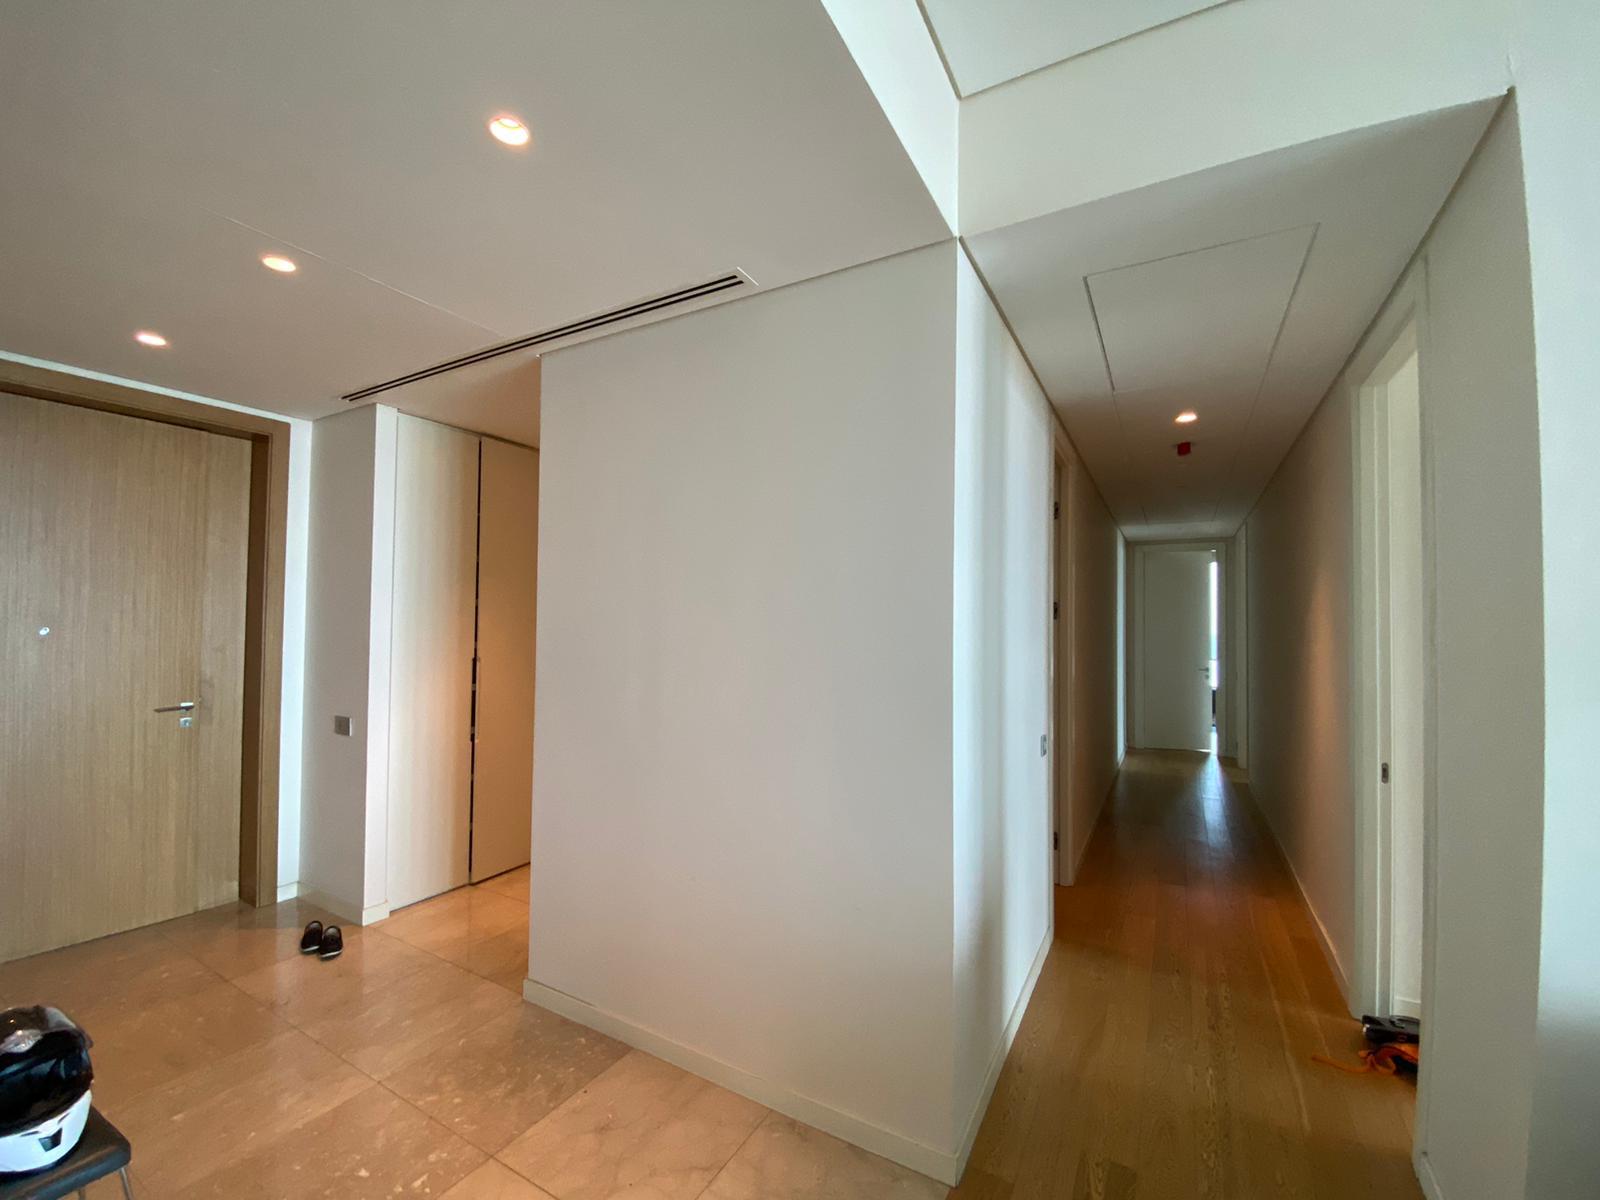 penthouse-istanbul-sapphire-tower-42th-floor-011.jpg